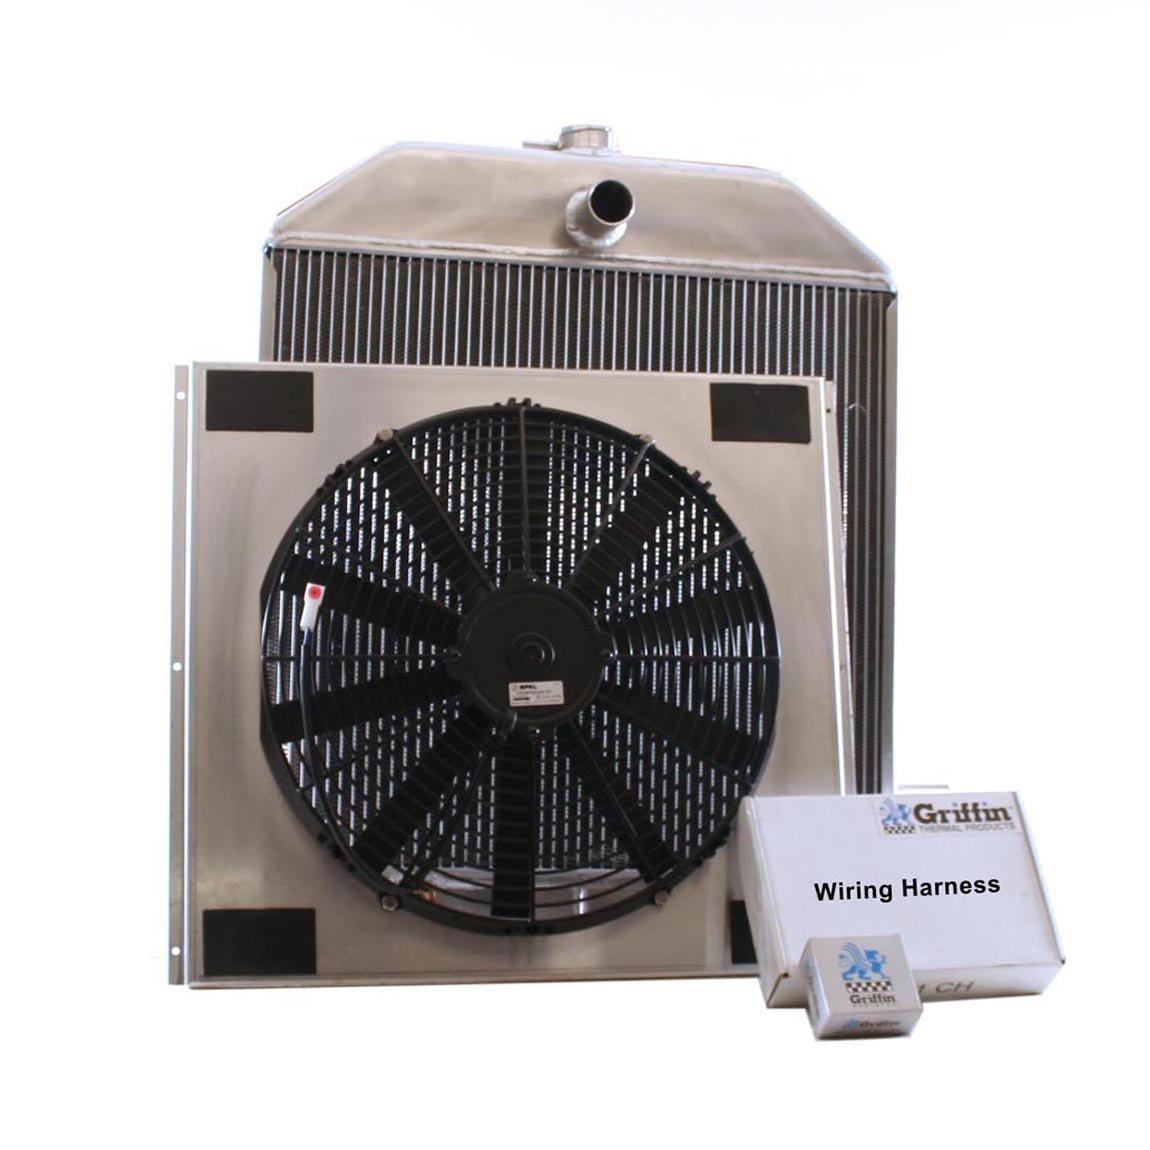 Griffin Radiator CU-70102 ComboUnit Radiator and Electric Fan Kit